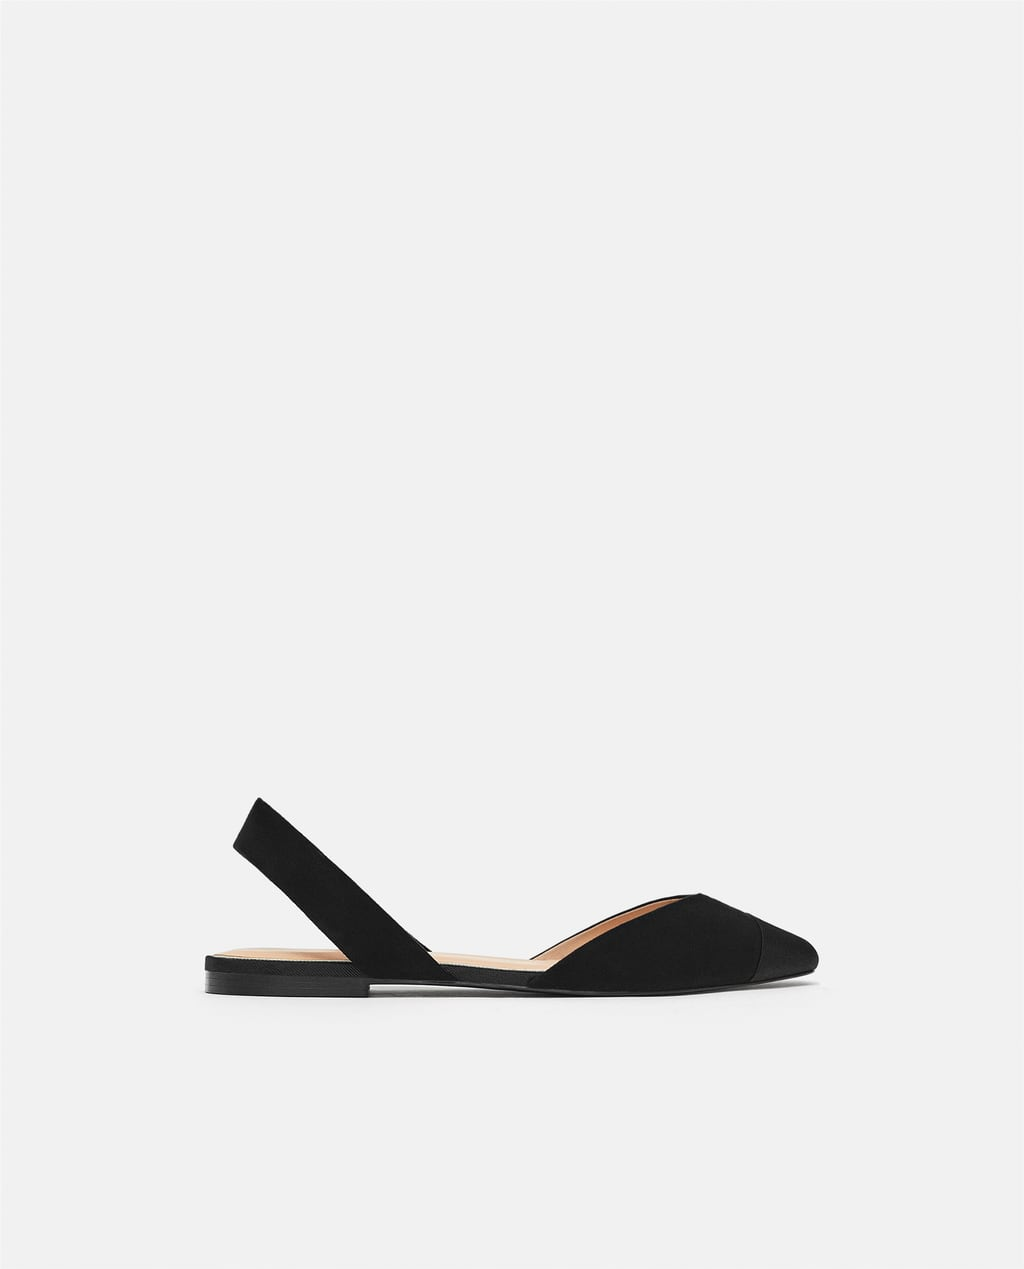 Zapatos negros de verano